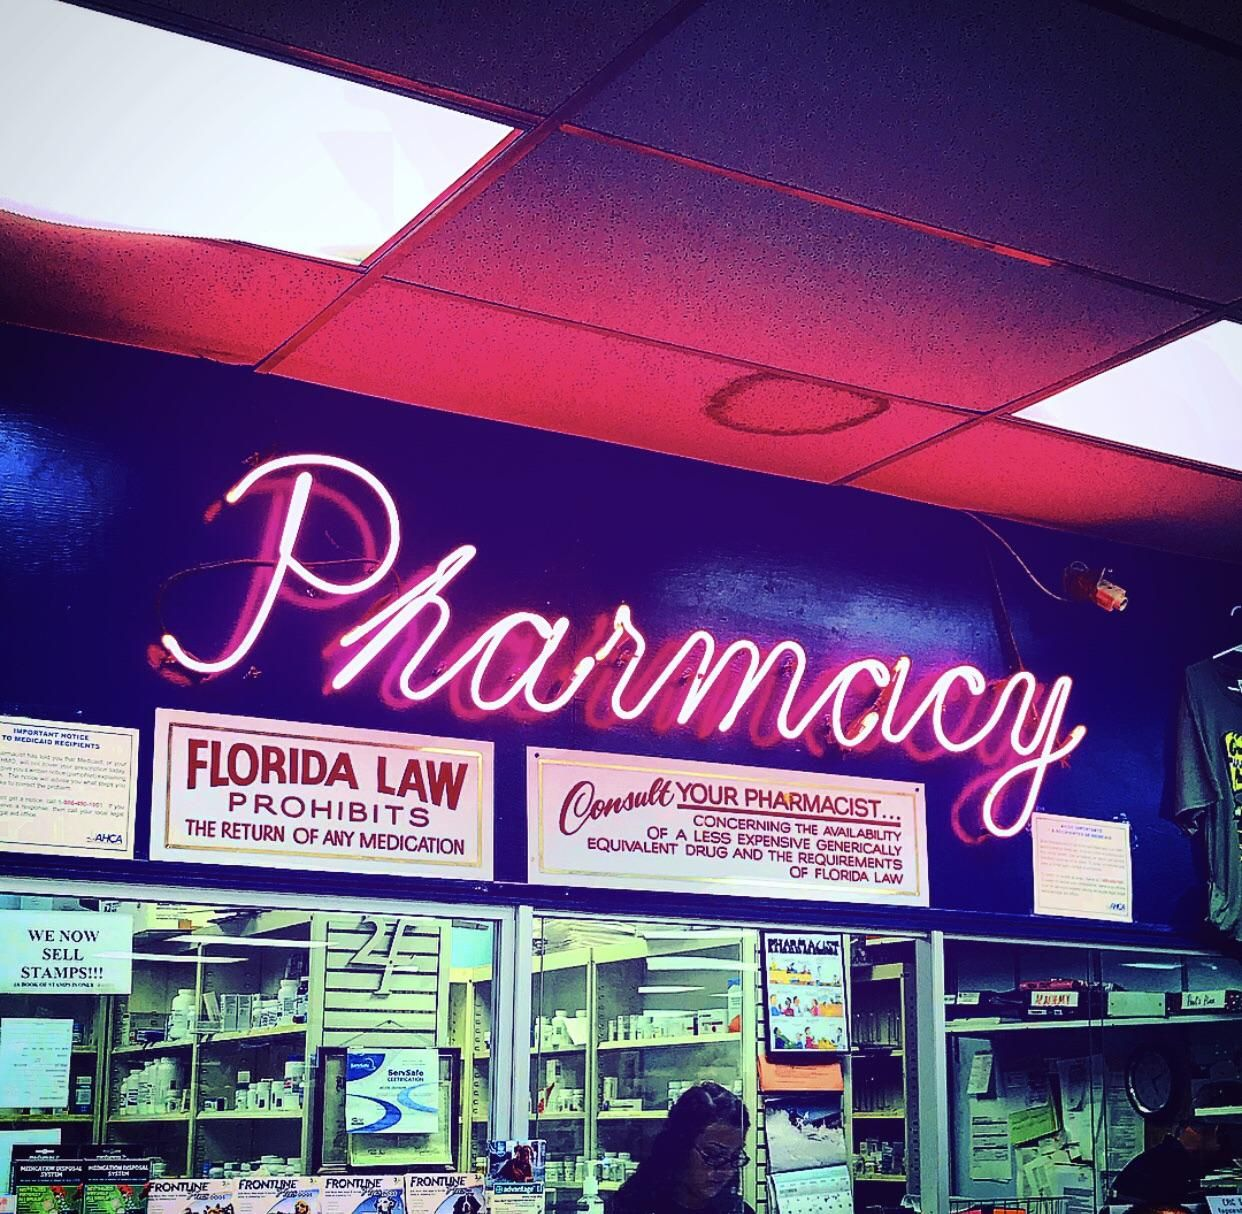 Greens Pharmacy Florida Pharmacy, Pharmacist, Florida